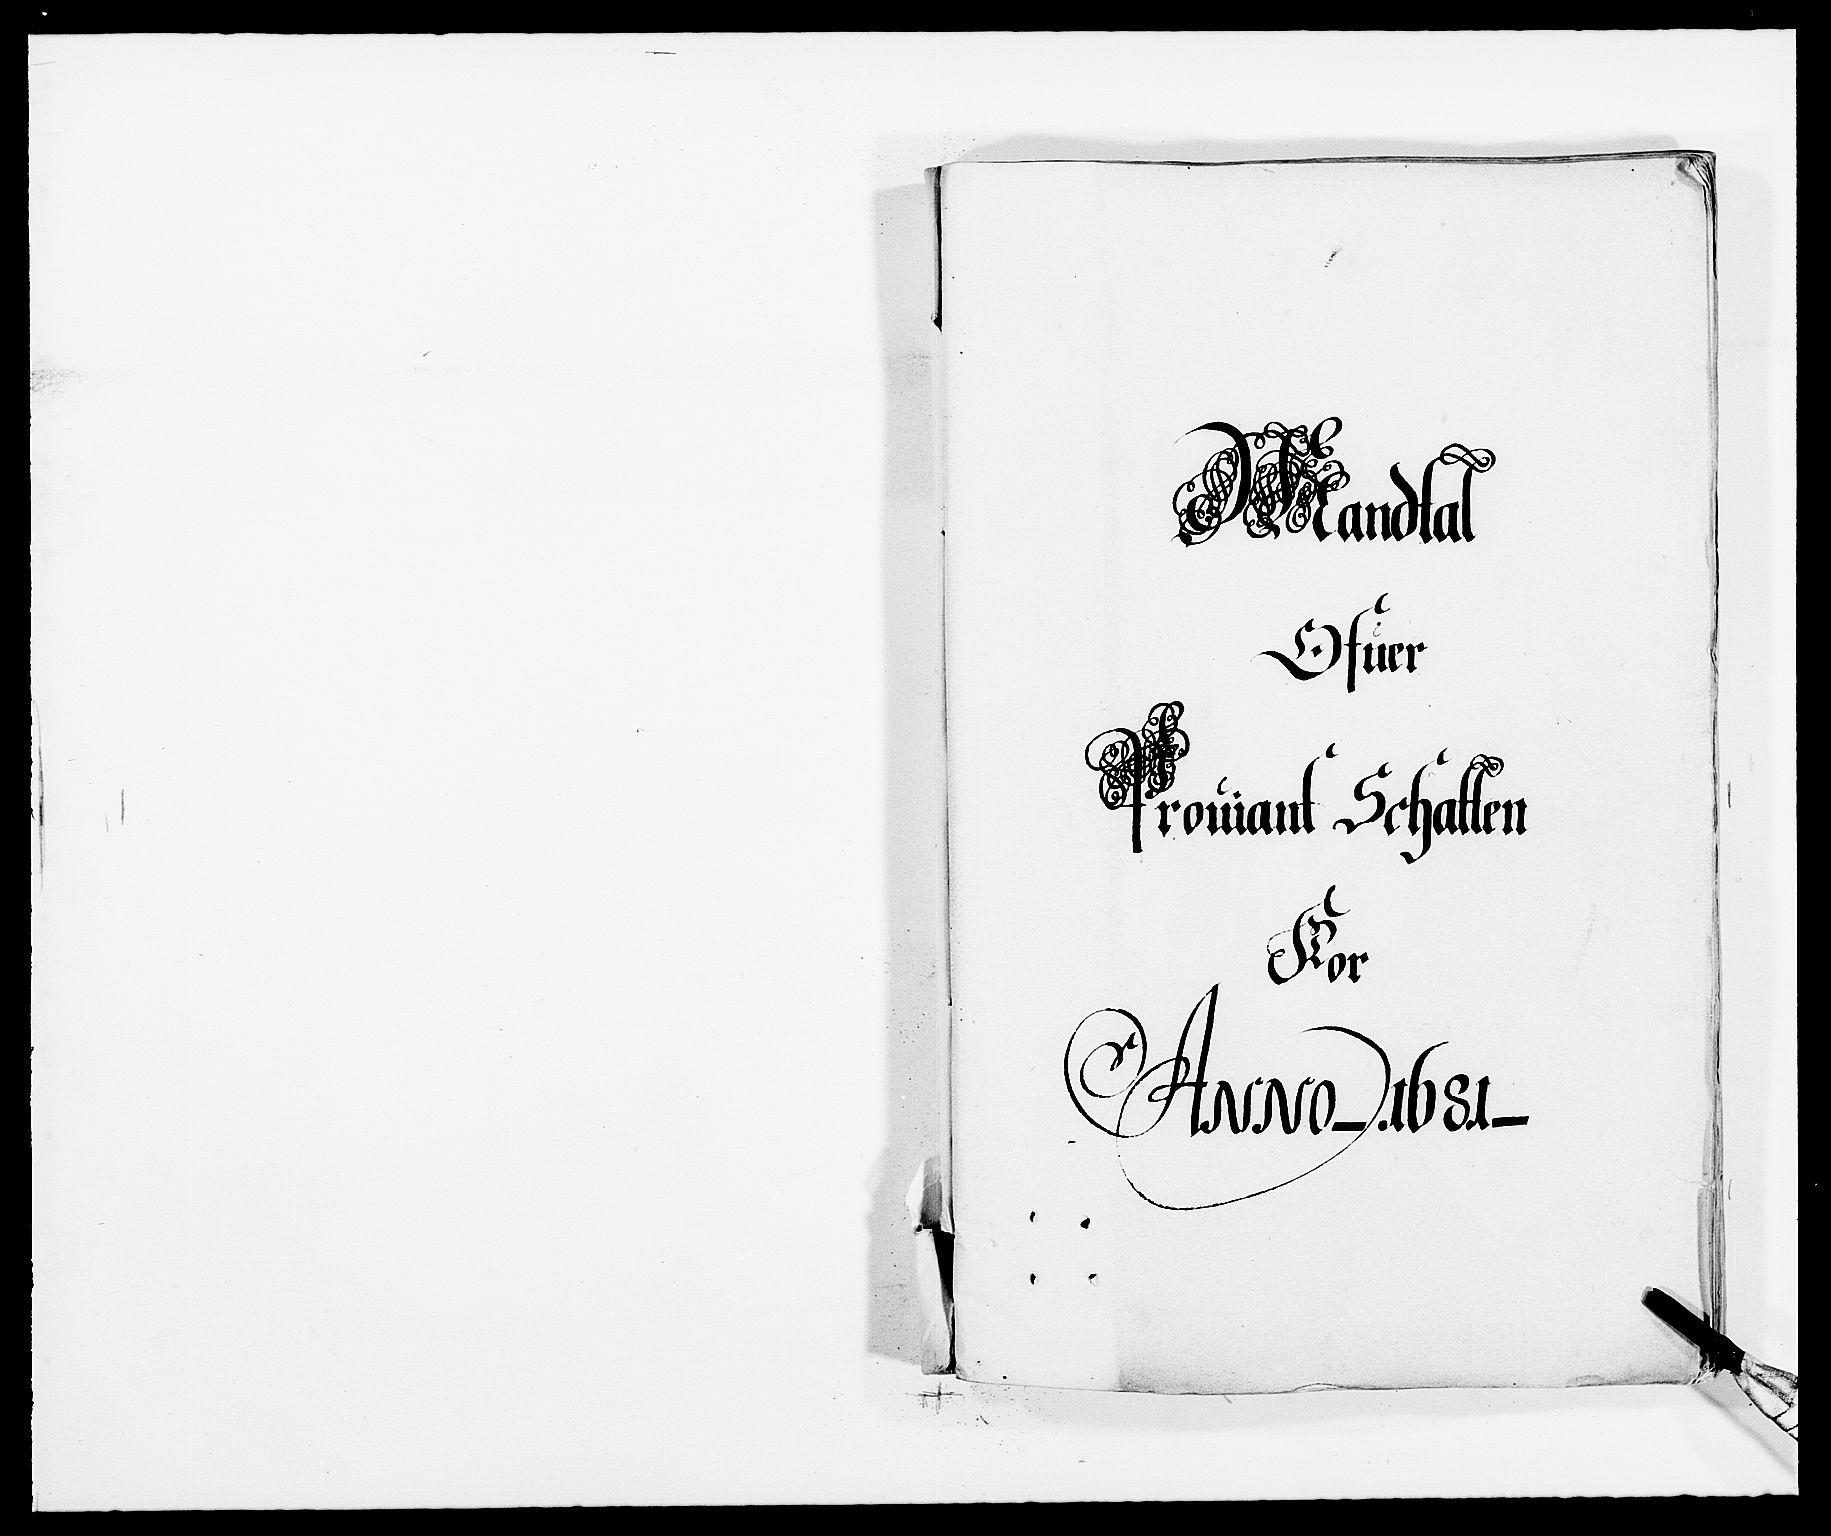 RA, Rentekammeret inntil 1814, Reviderte regnskaper, Fogderegnskap, R32/L1850: Fogderegnskap Jarlsberg grevskap, 1681, s. 134